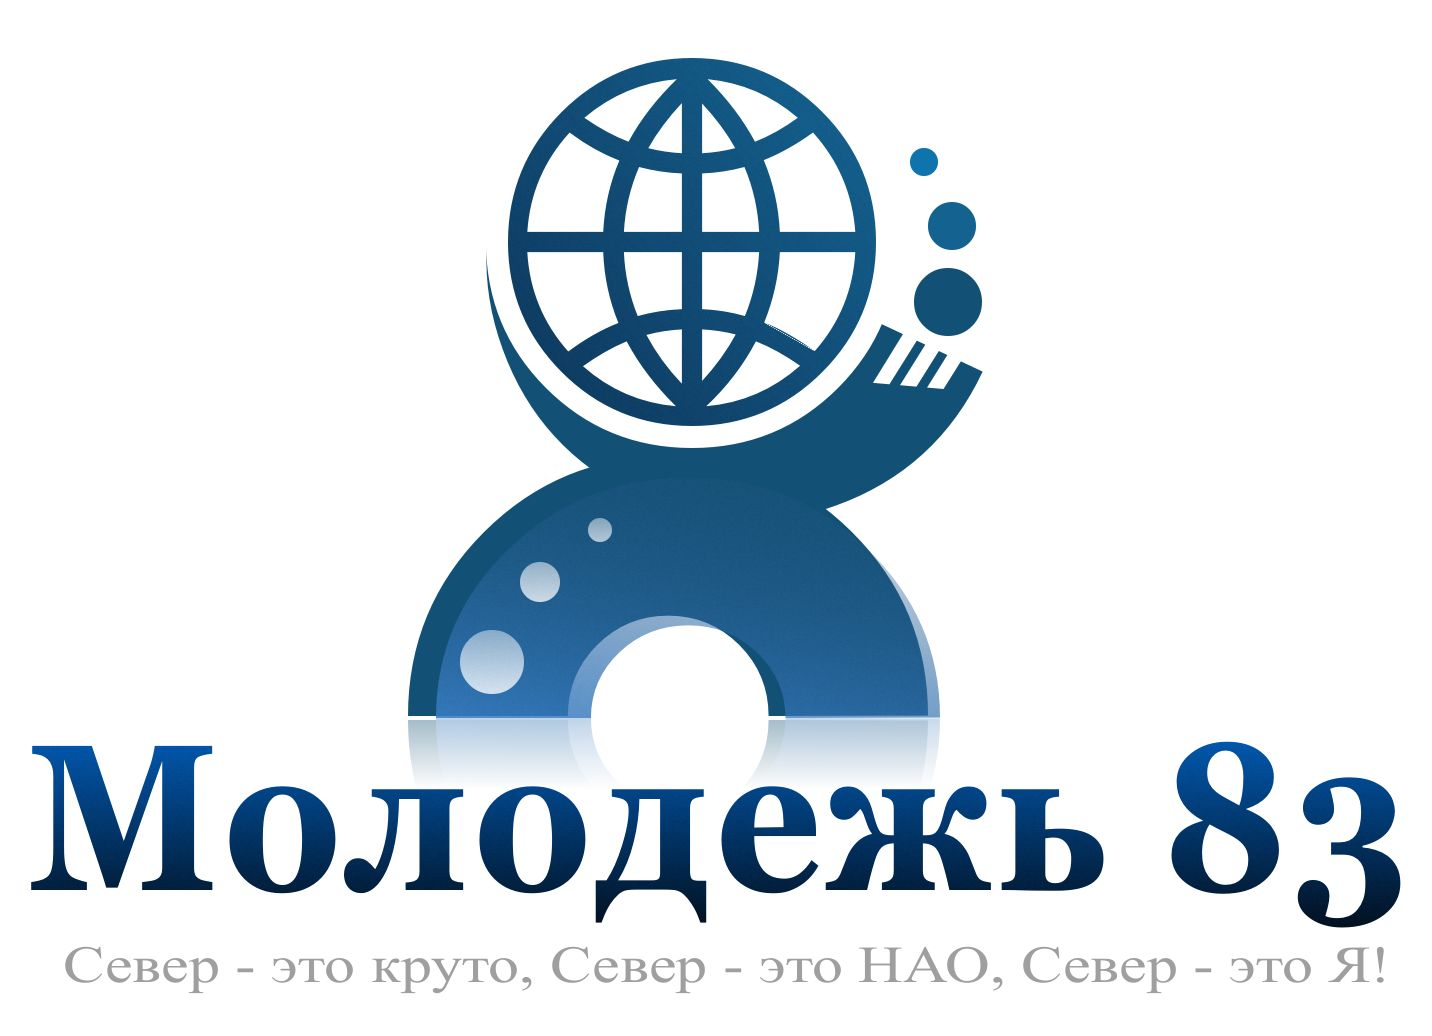 Логотип Моложедь Ненецкого автономного округа - дизайнер BeSSpaloFF